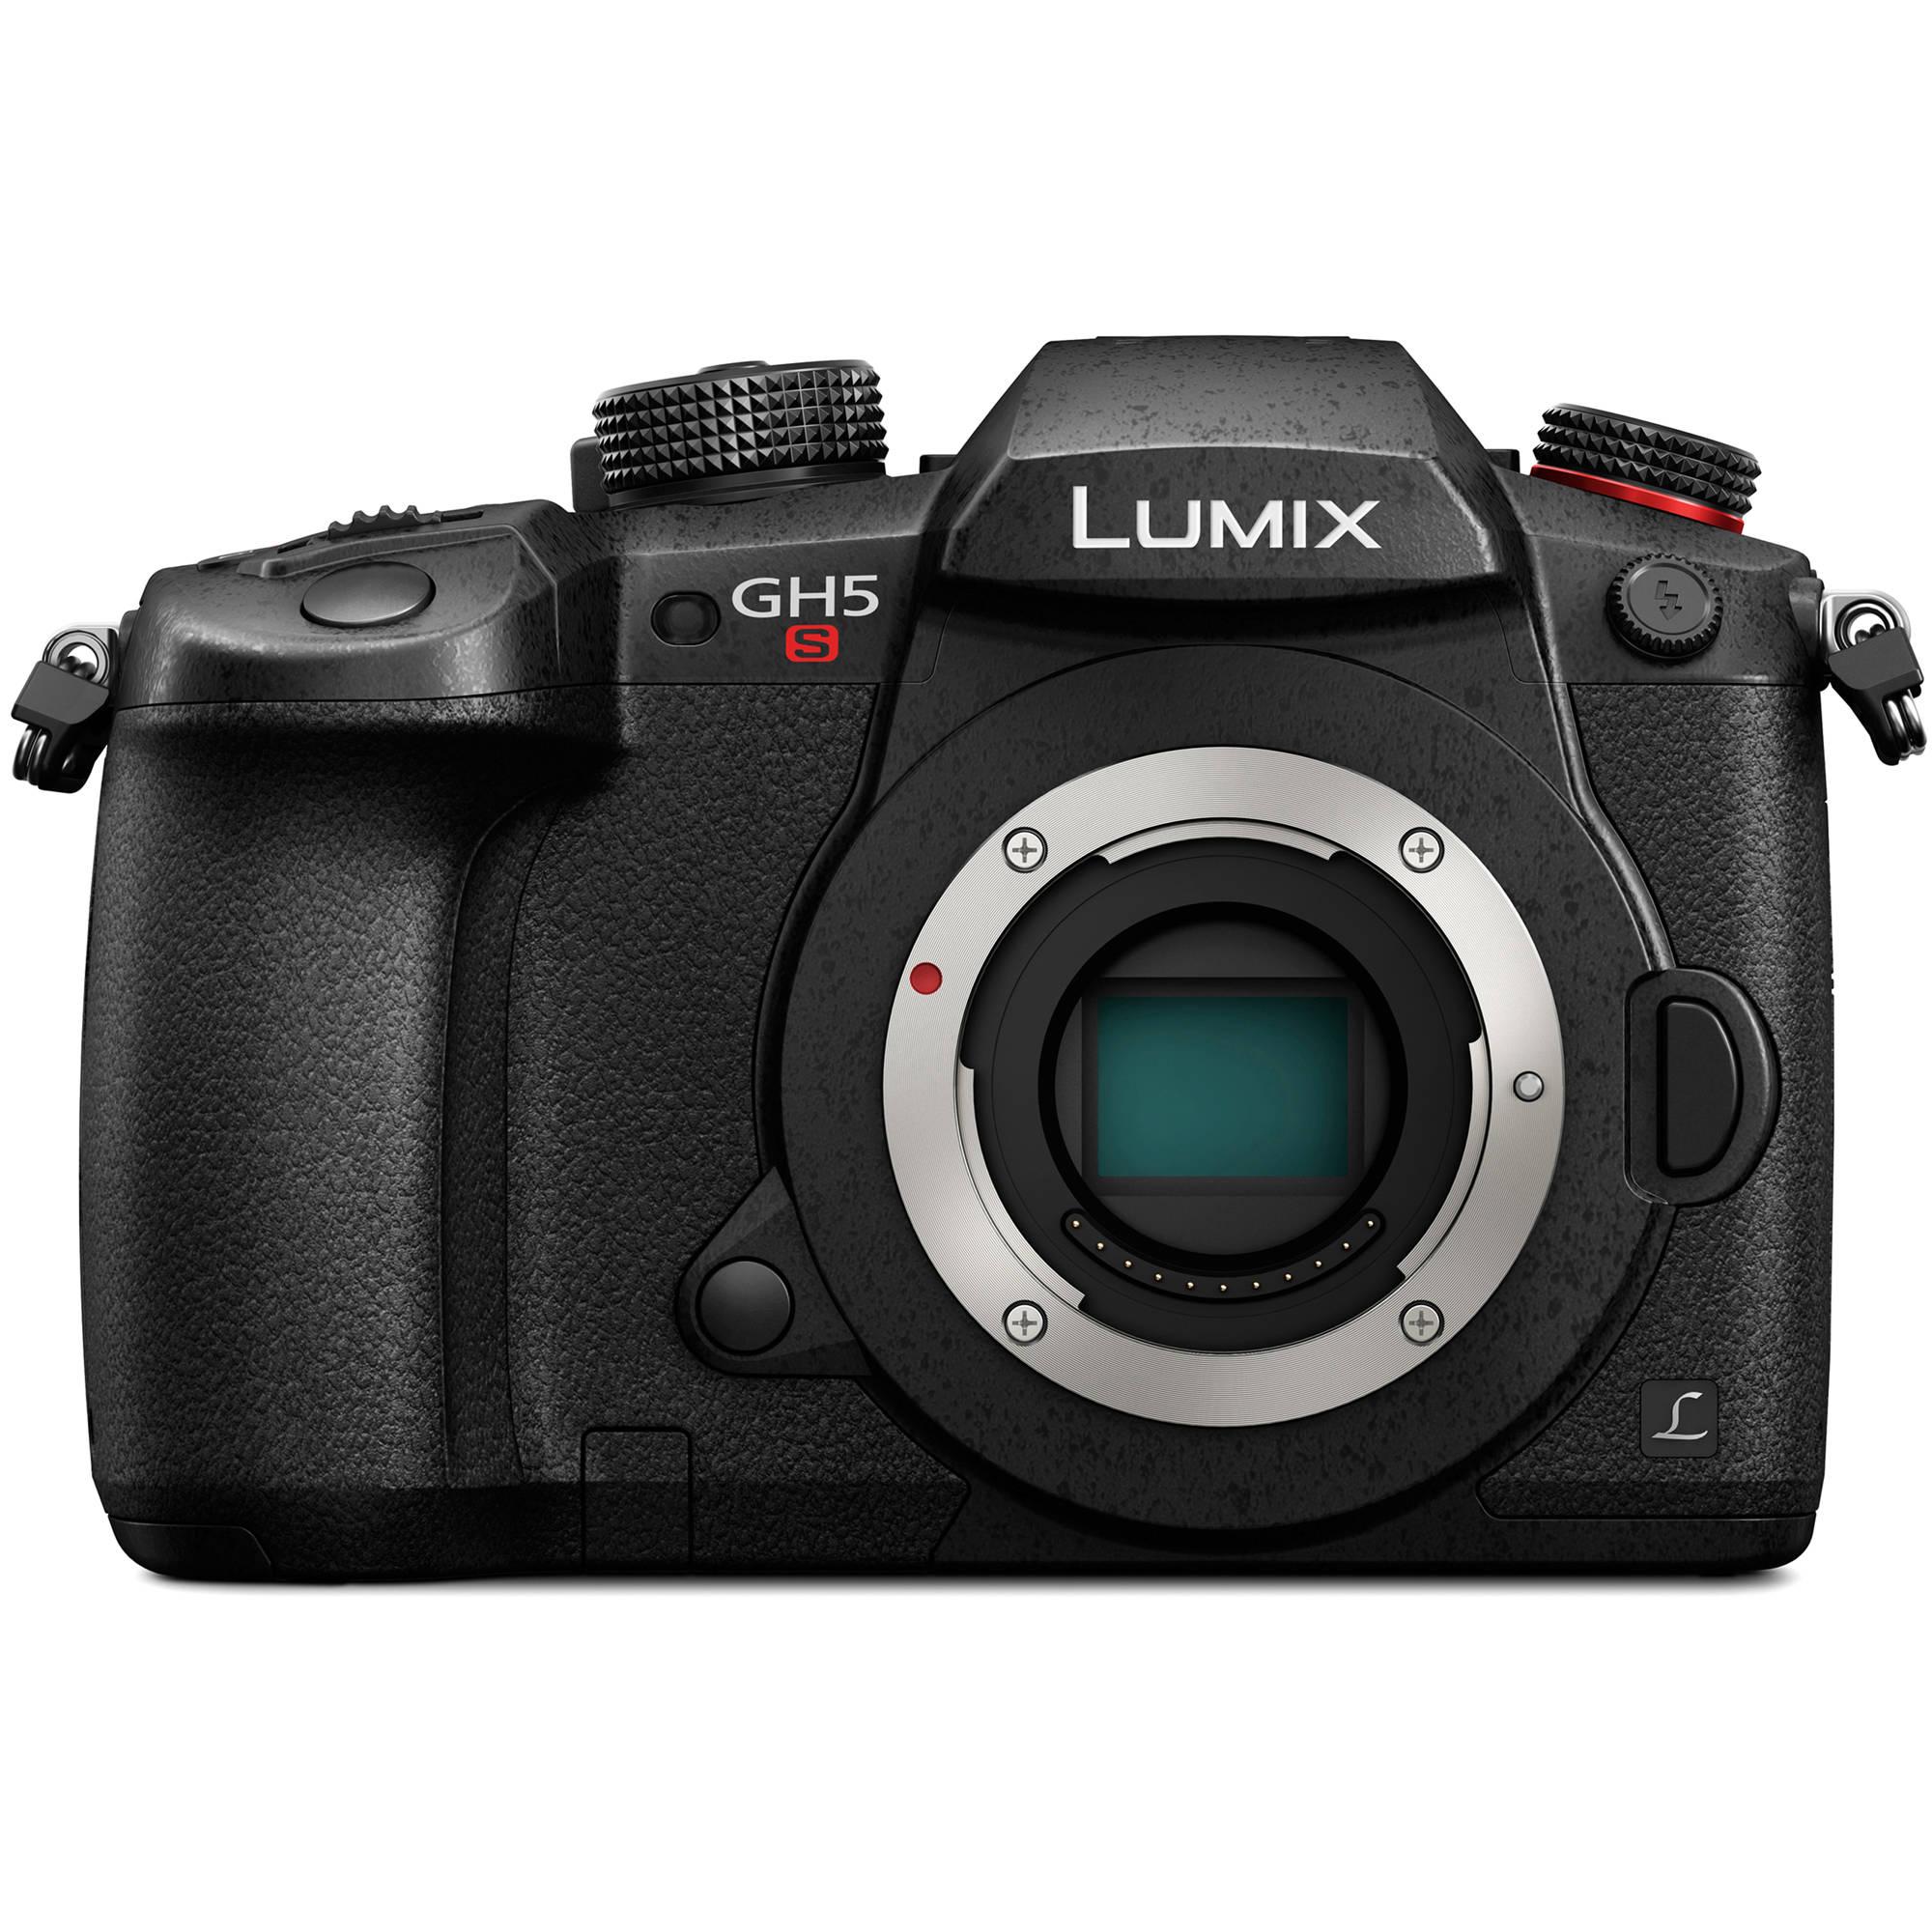 Panasonic Gh5s Lumix Mirrorless Micro Four Thirds Dc Bh V Groove Mos Vmos Digital Camera